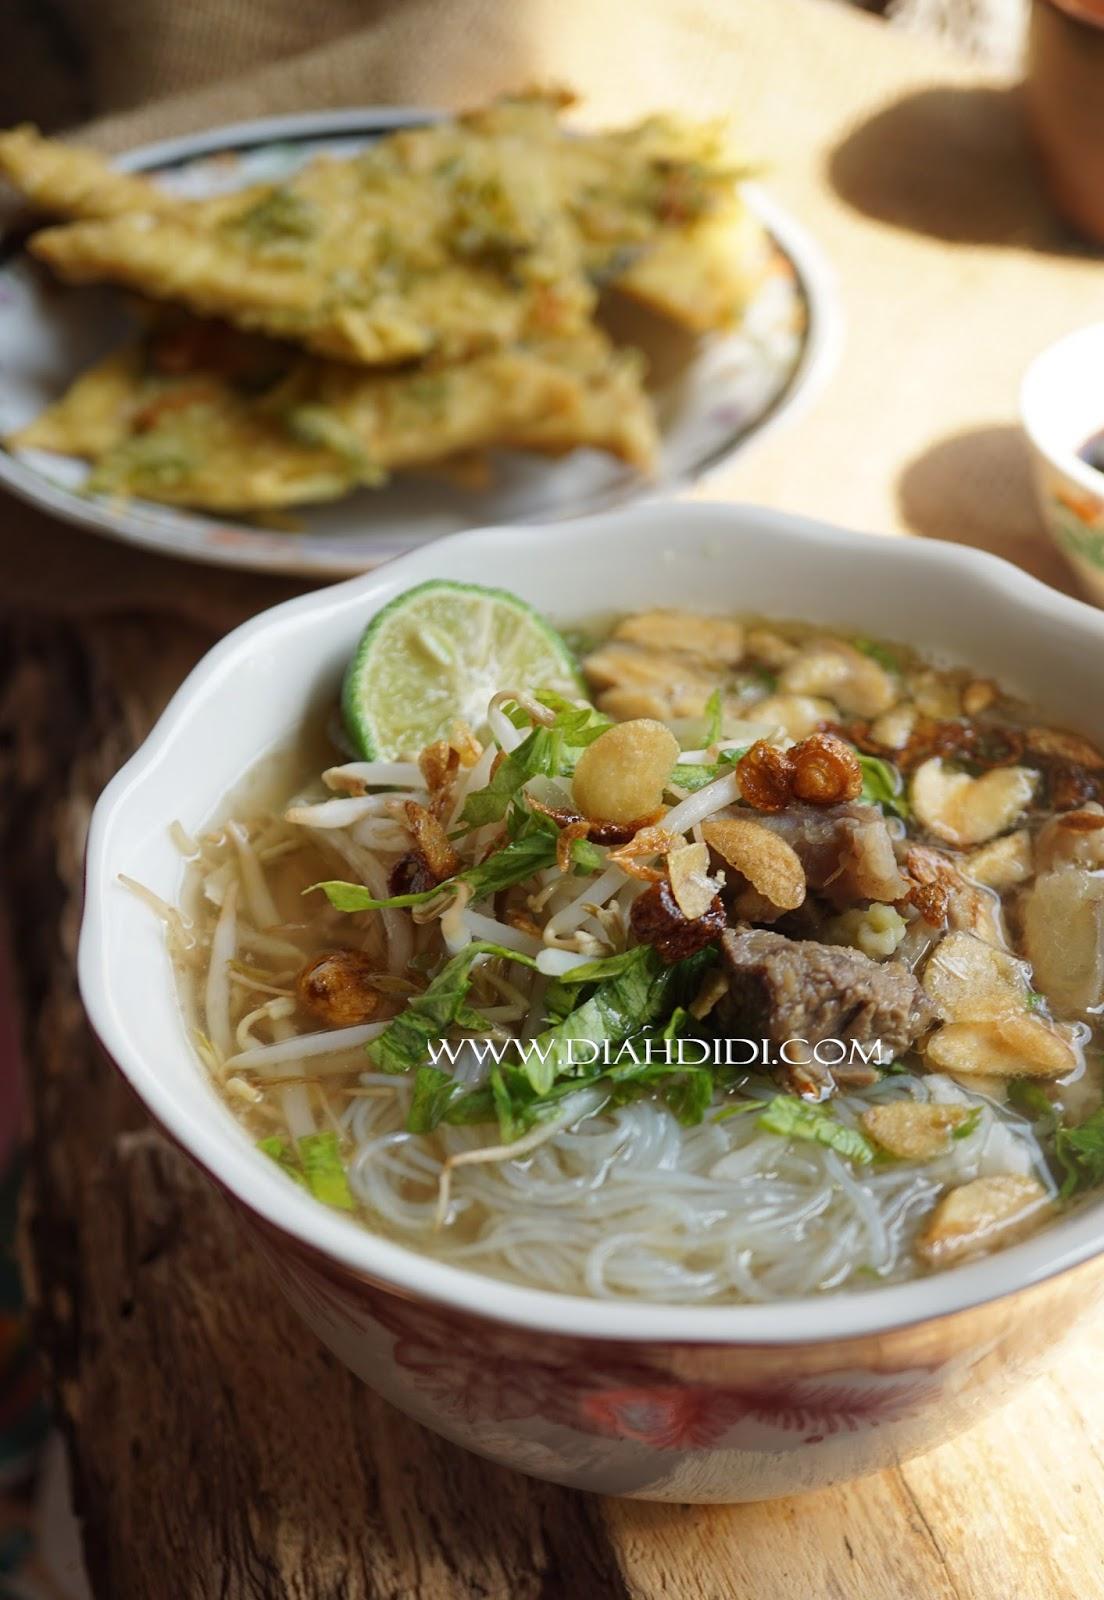 Resep Soto Boyolali : resep, boyolali, Didi's, Kitchen:, Bening, Daging